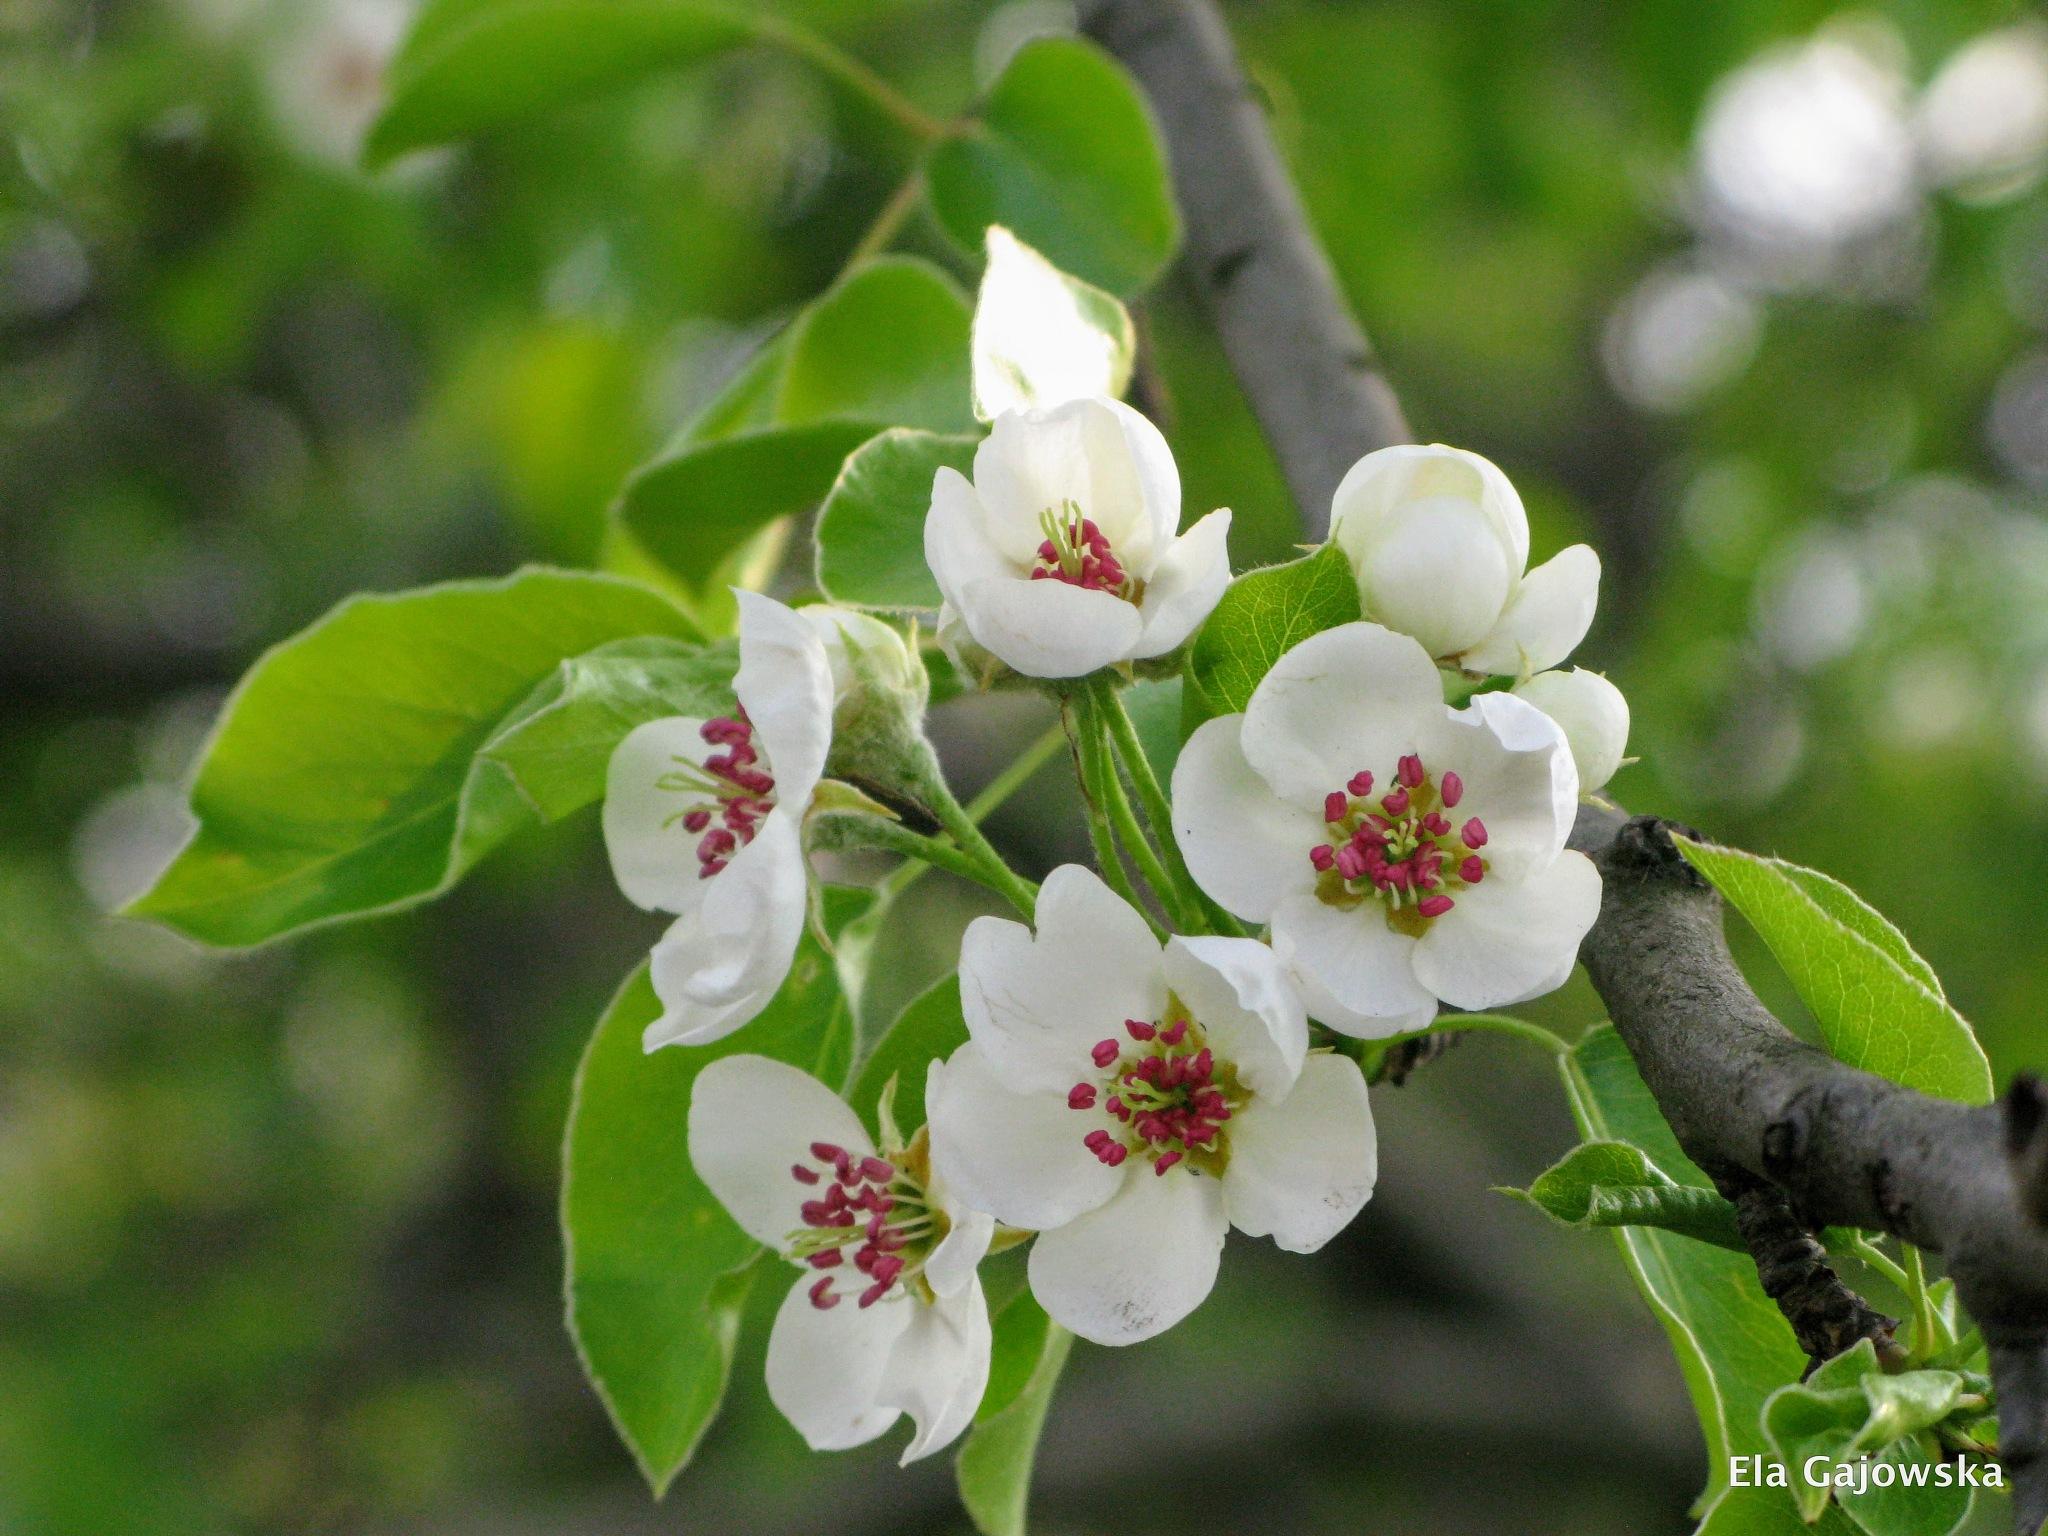 Enjoying spring beauty by Ela Gajowska